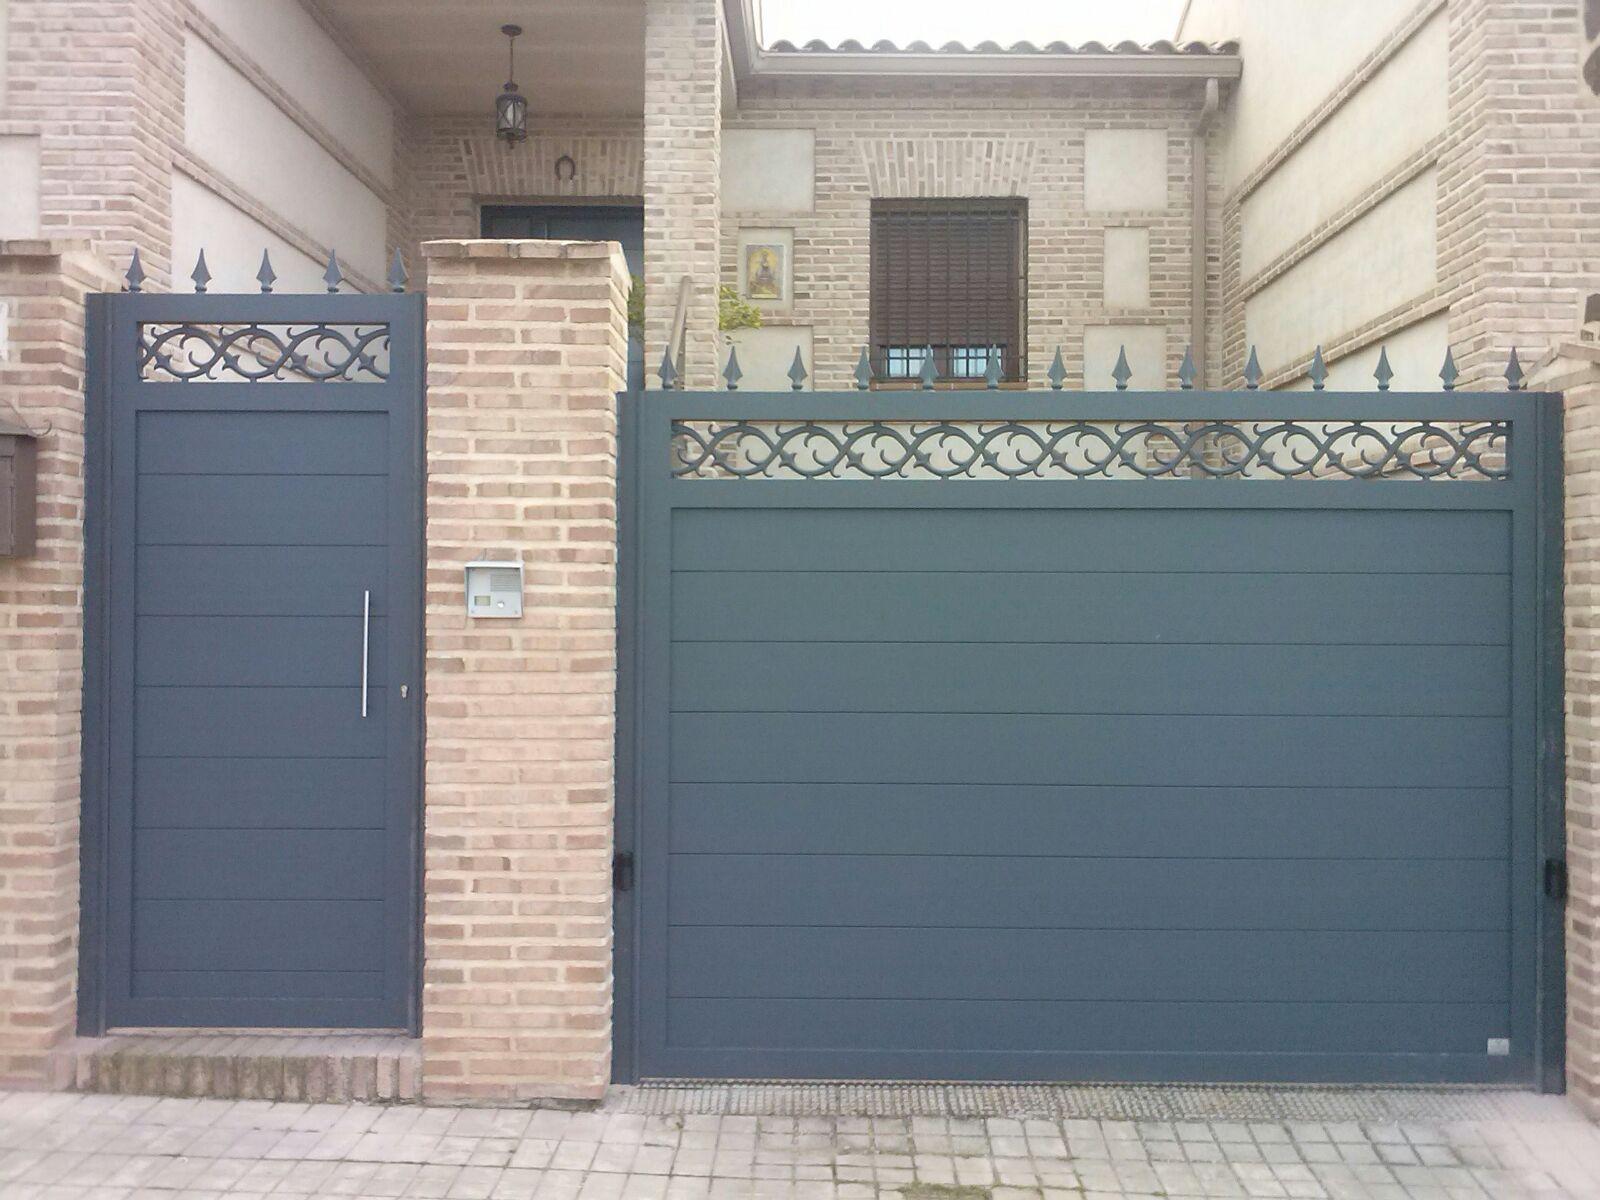 Puertas de aluminio para exterior grupo marver - Modelos de puertas de aluminio para exterior ...